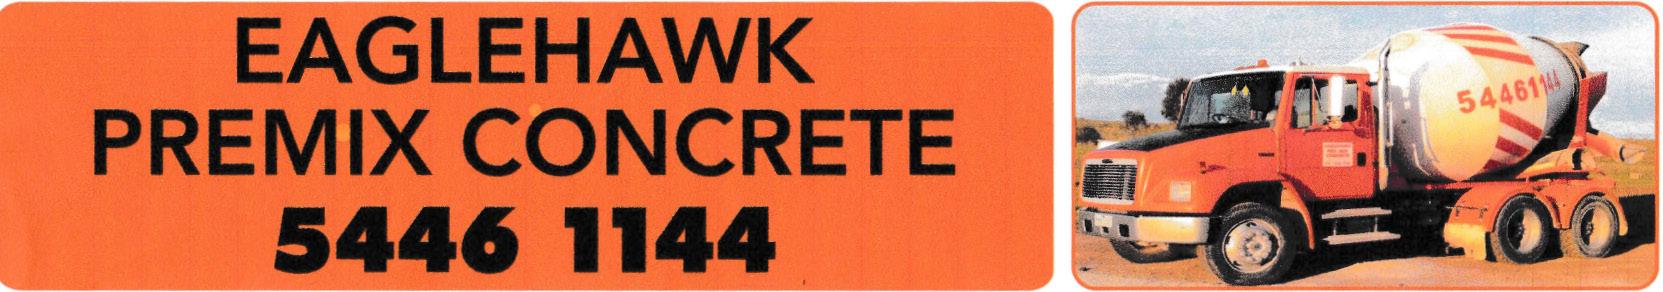 Eaglehawk Premix Concrete